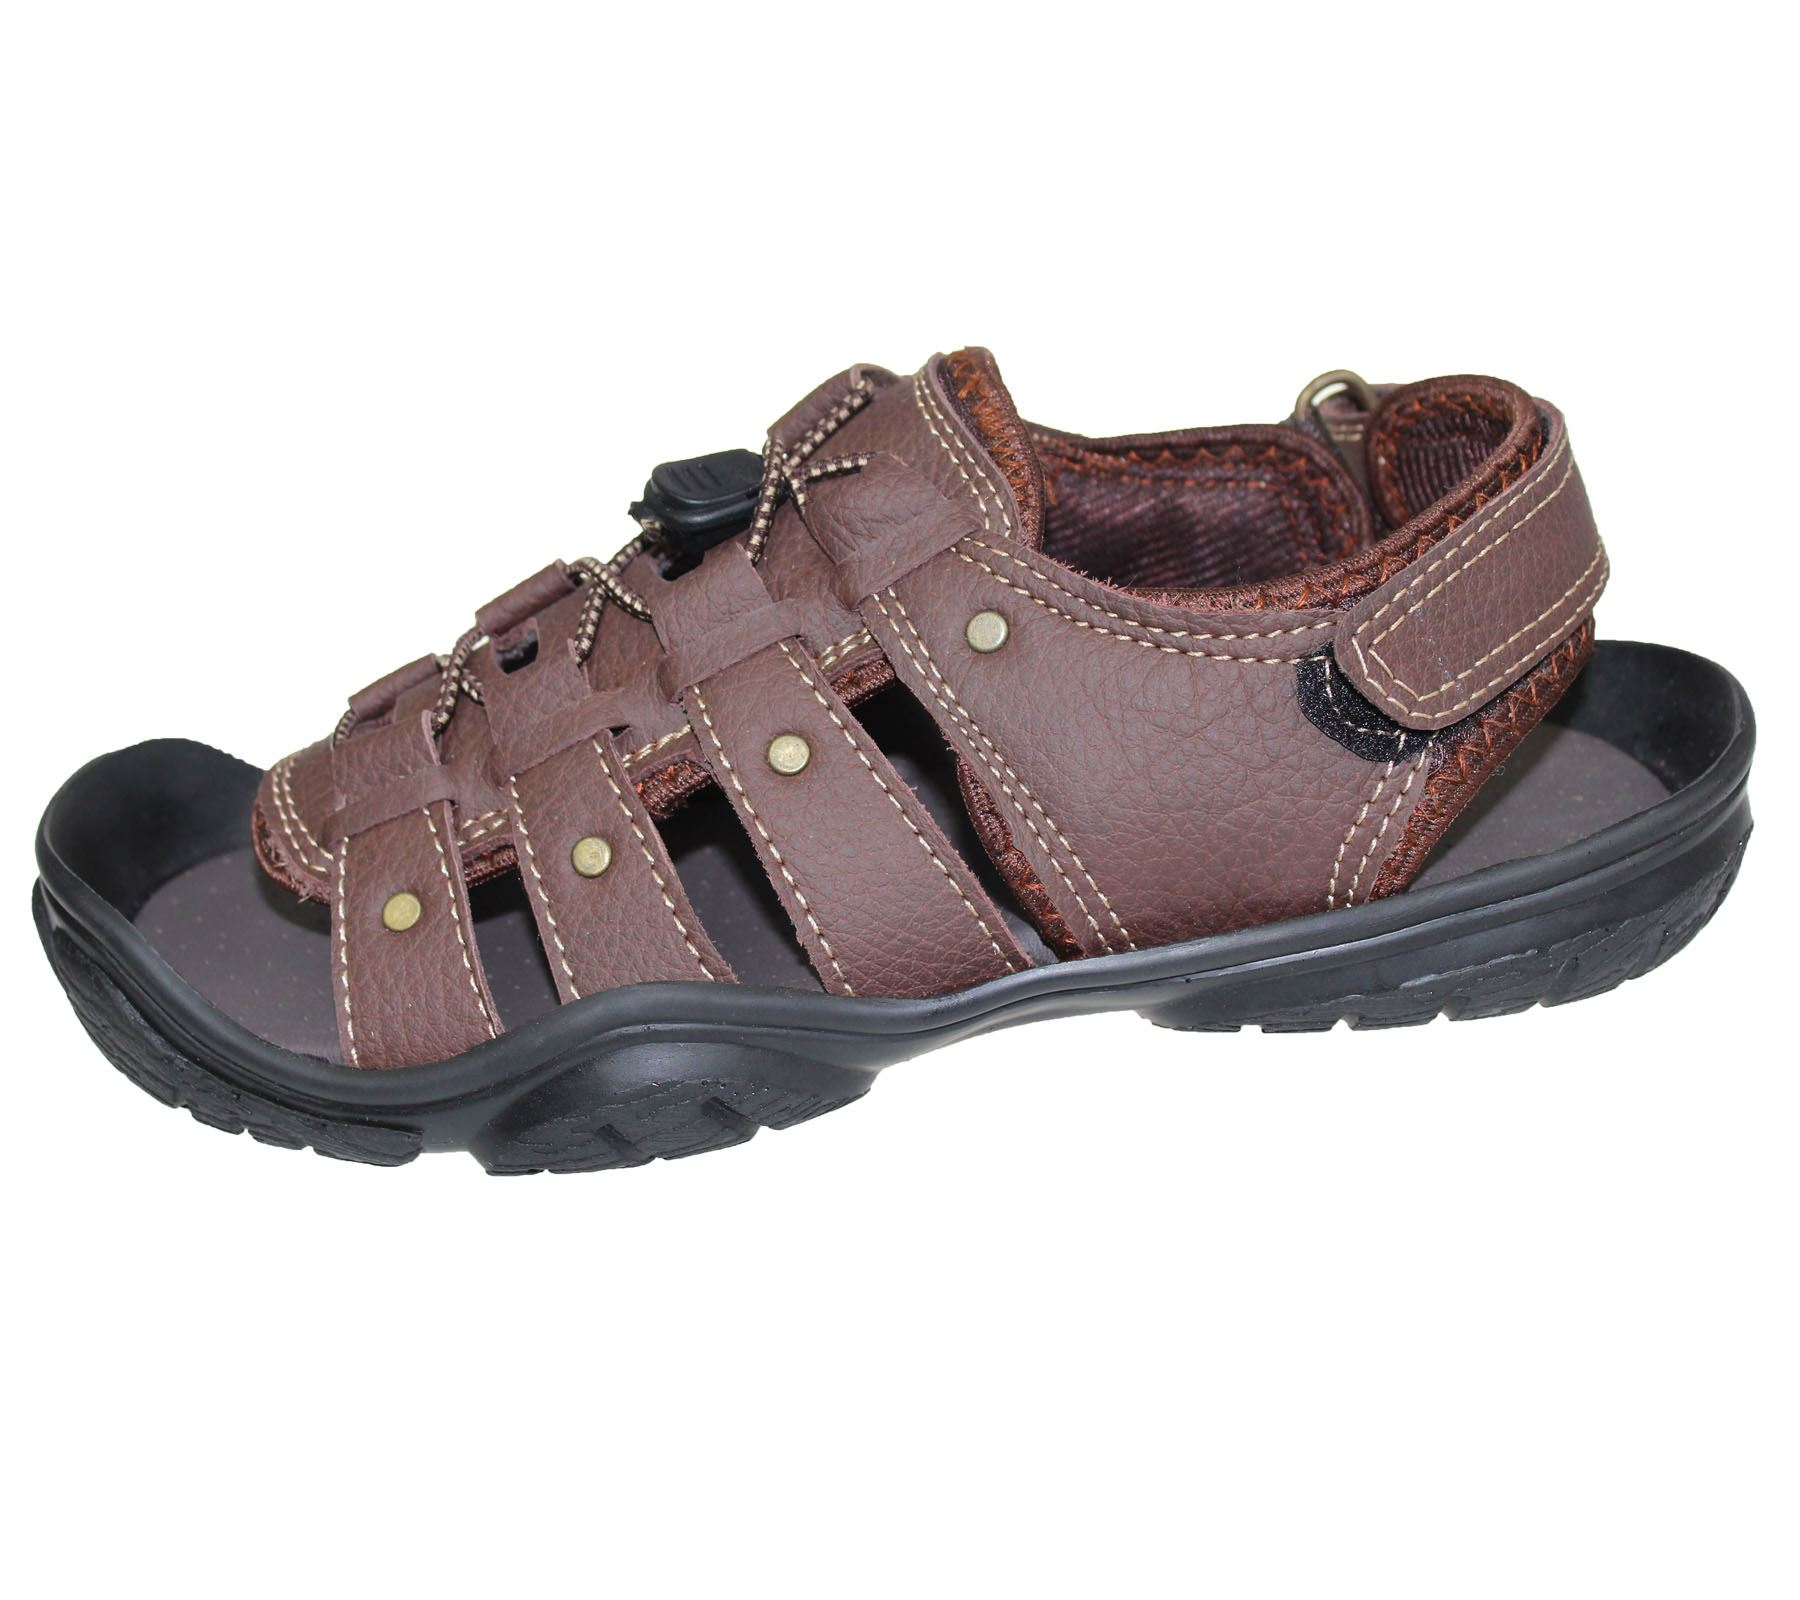 Boys Sandals Vecro Casual Sports Comfort Walking Summer Beach Mules Slipper